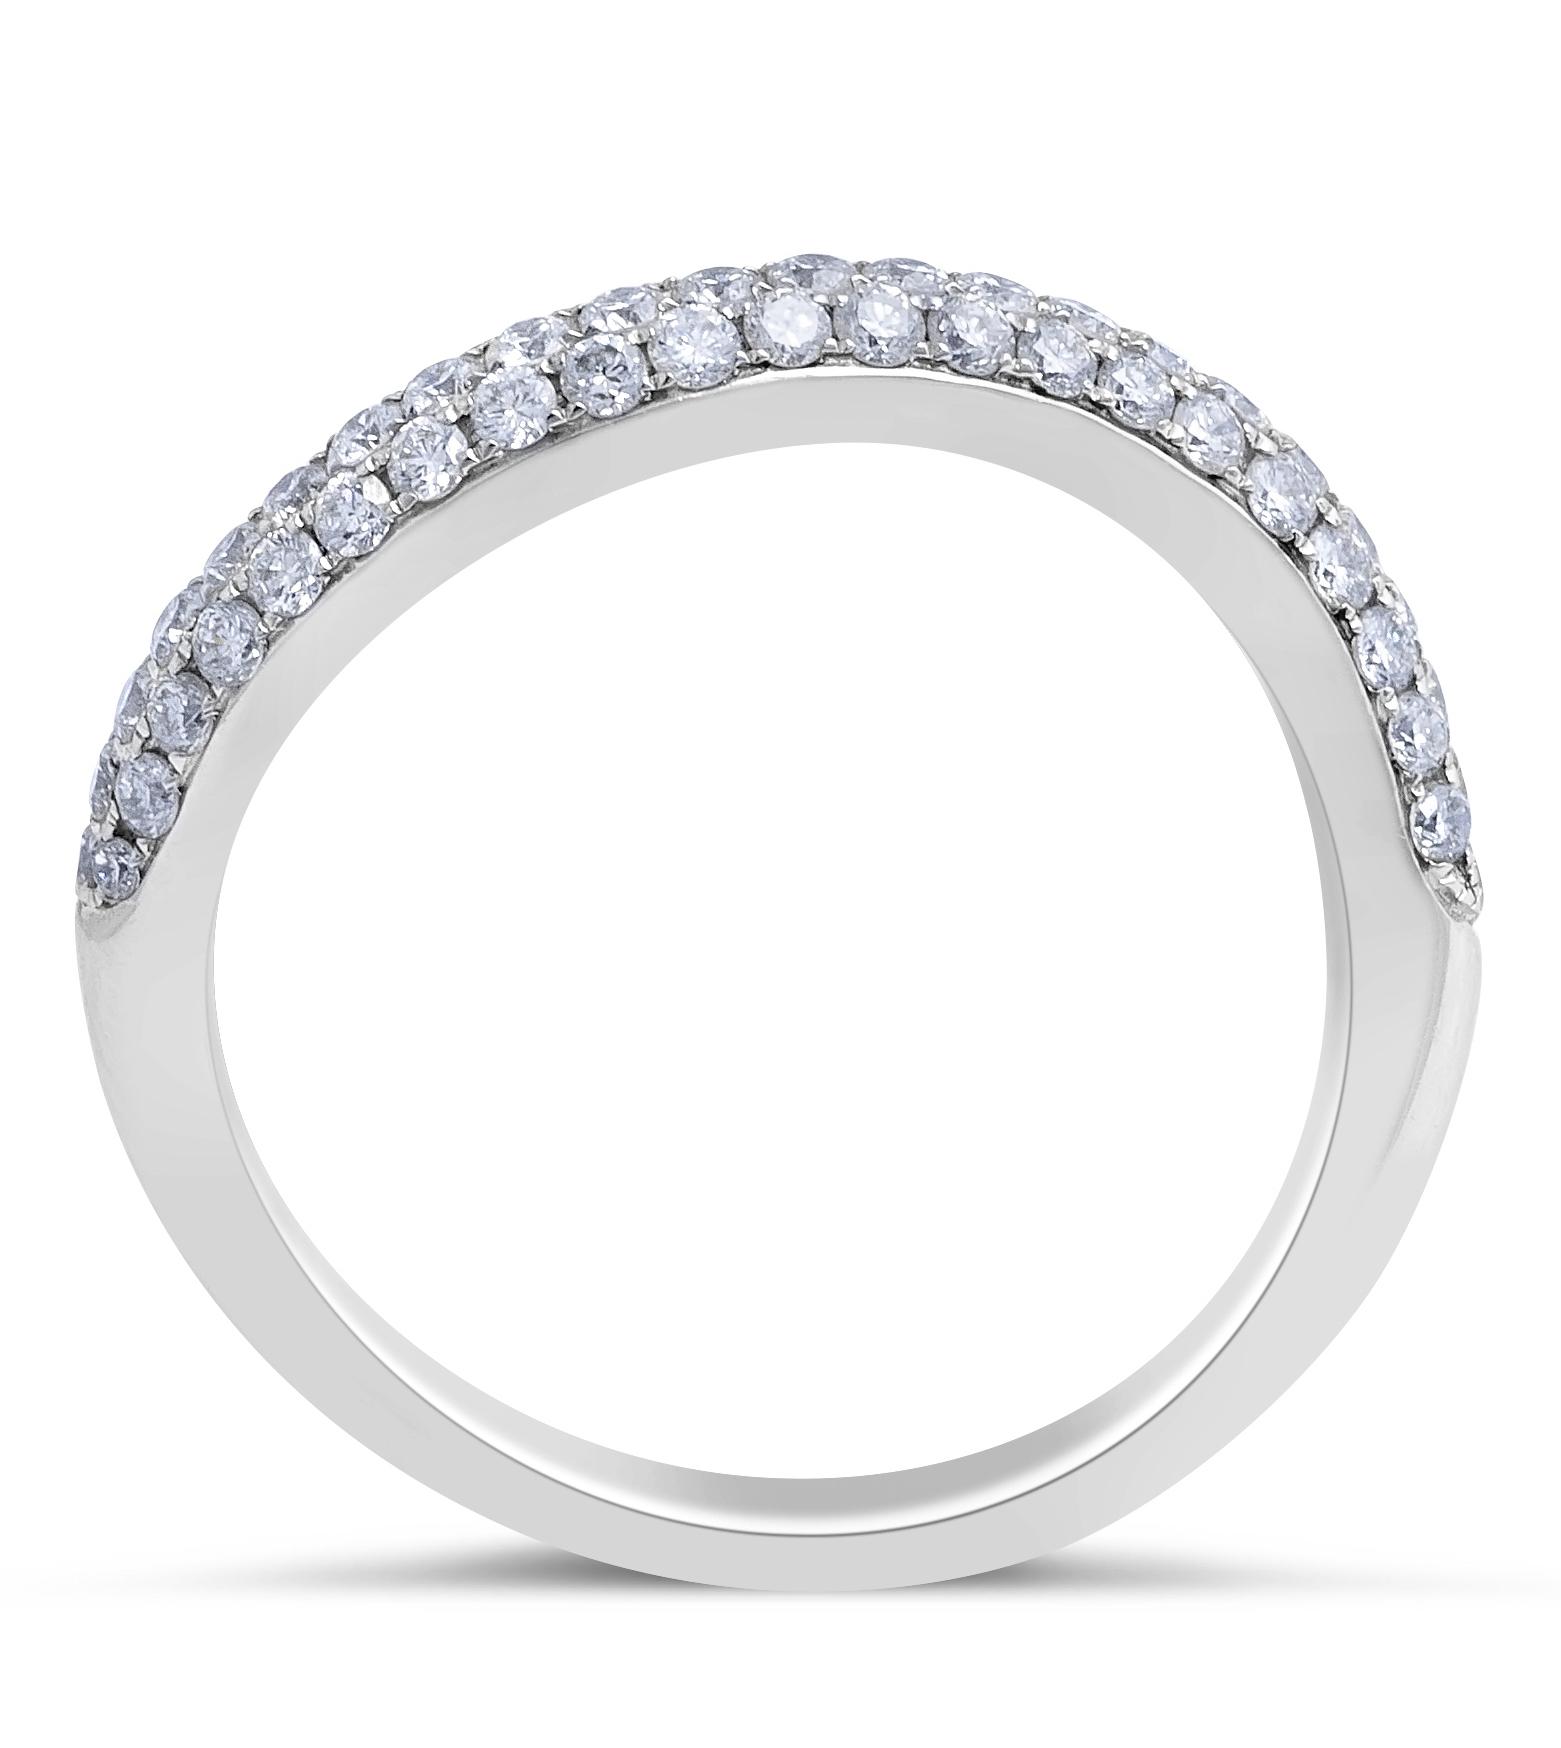 18 Karat White Gold Diamond Wedding Band in Micro Pave Setting